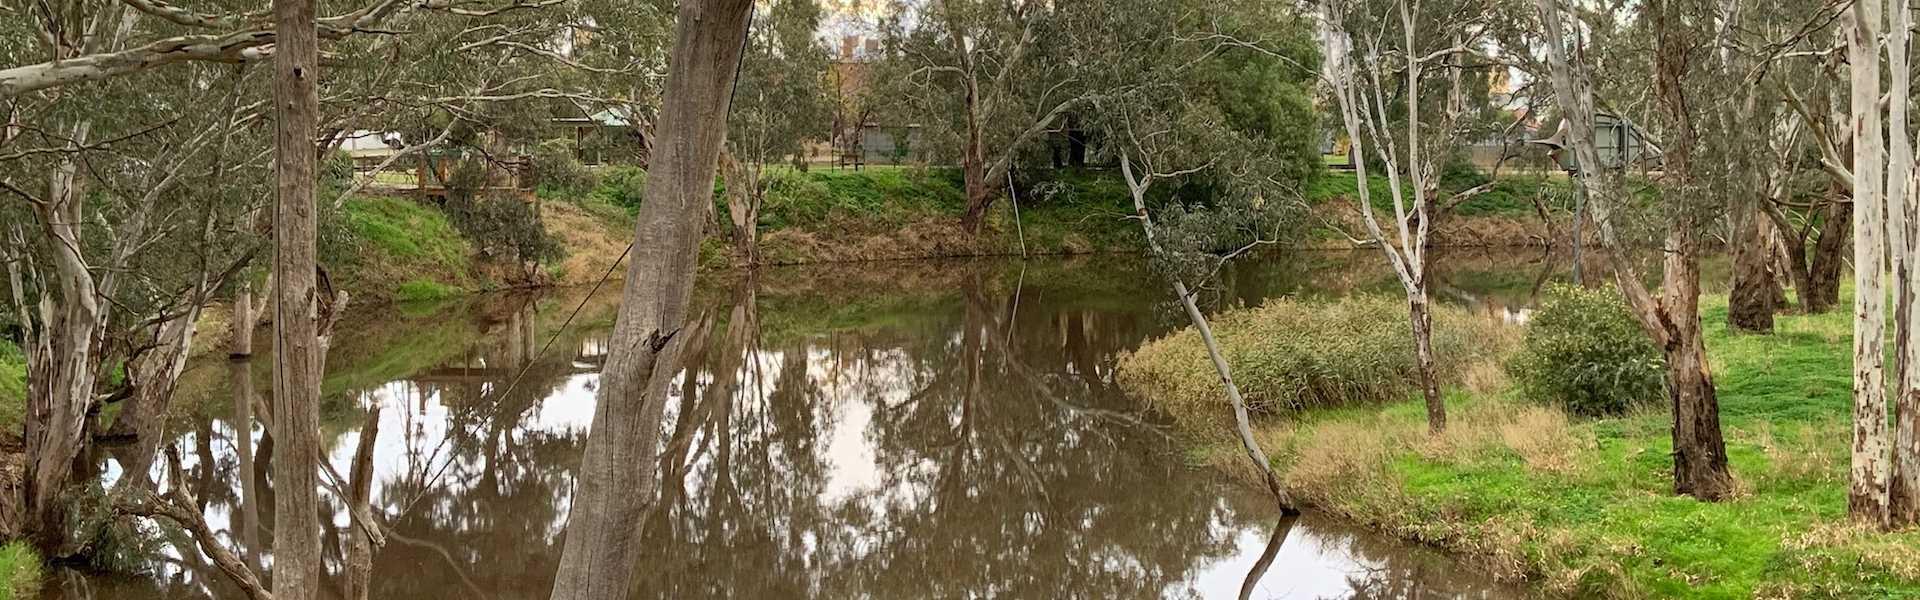 kui parks, charlton, travellers rest, caravan park, avoca river